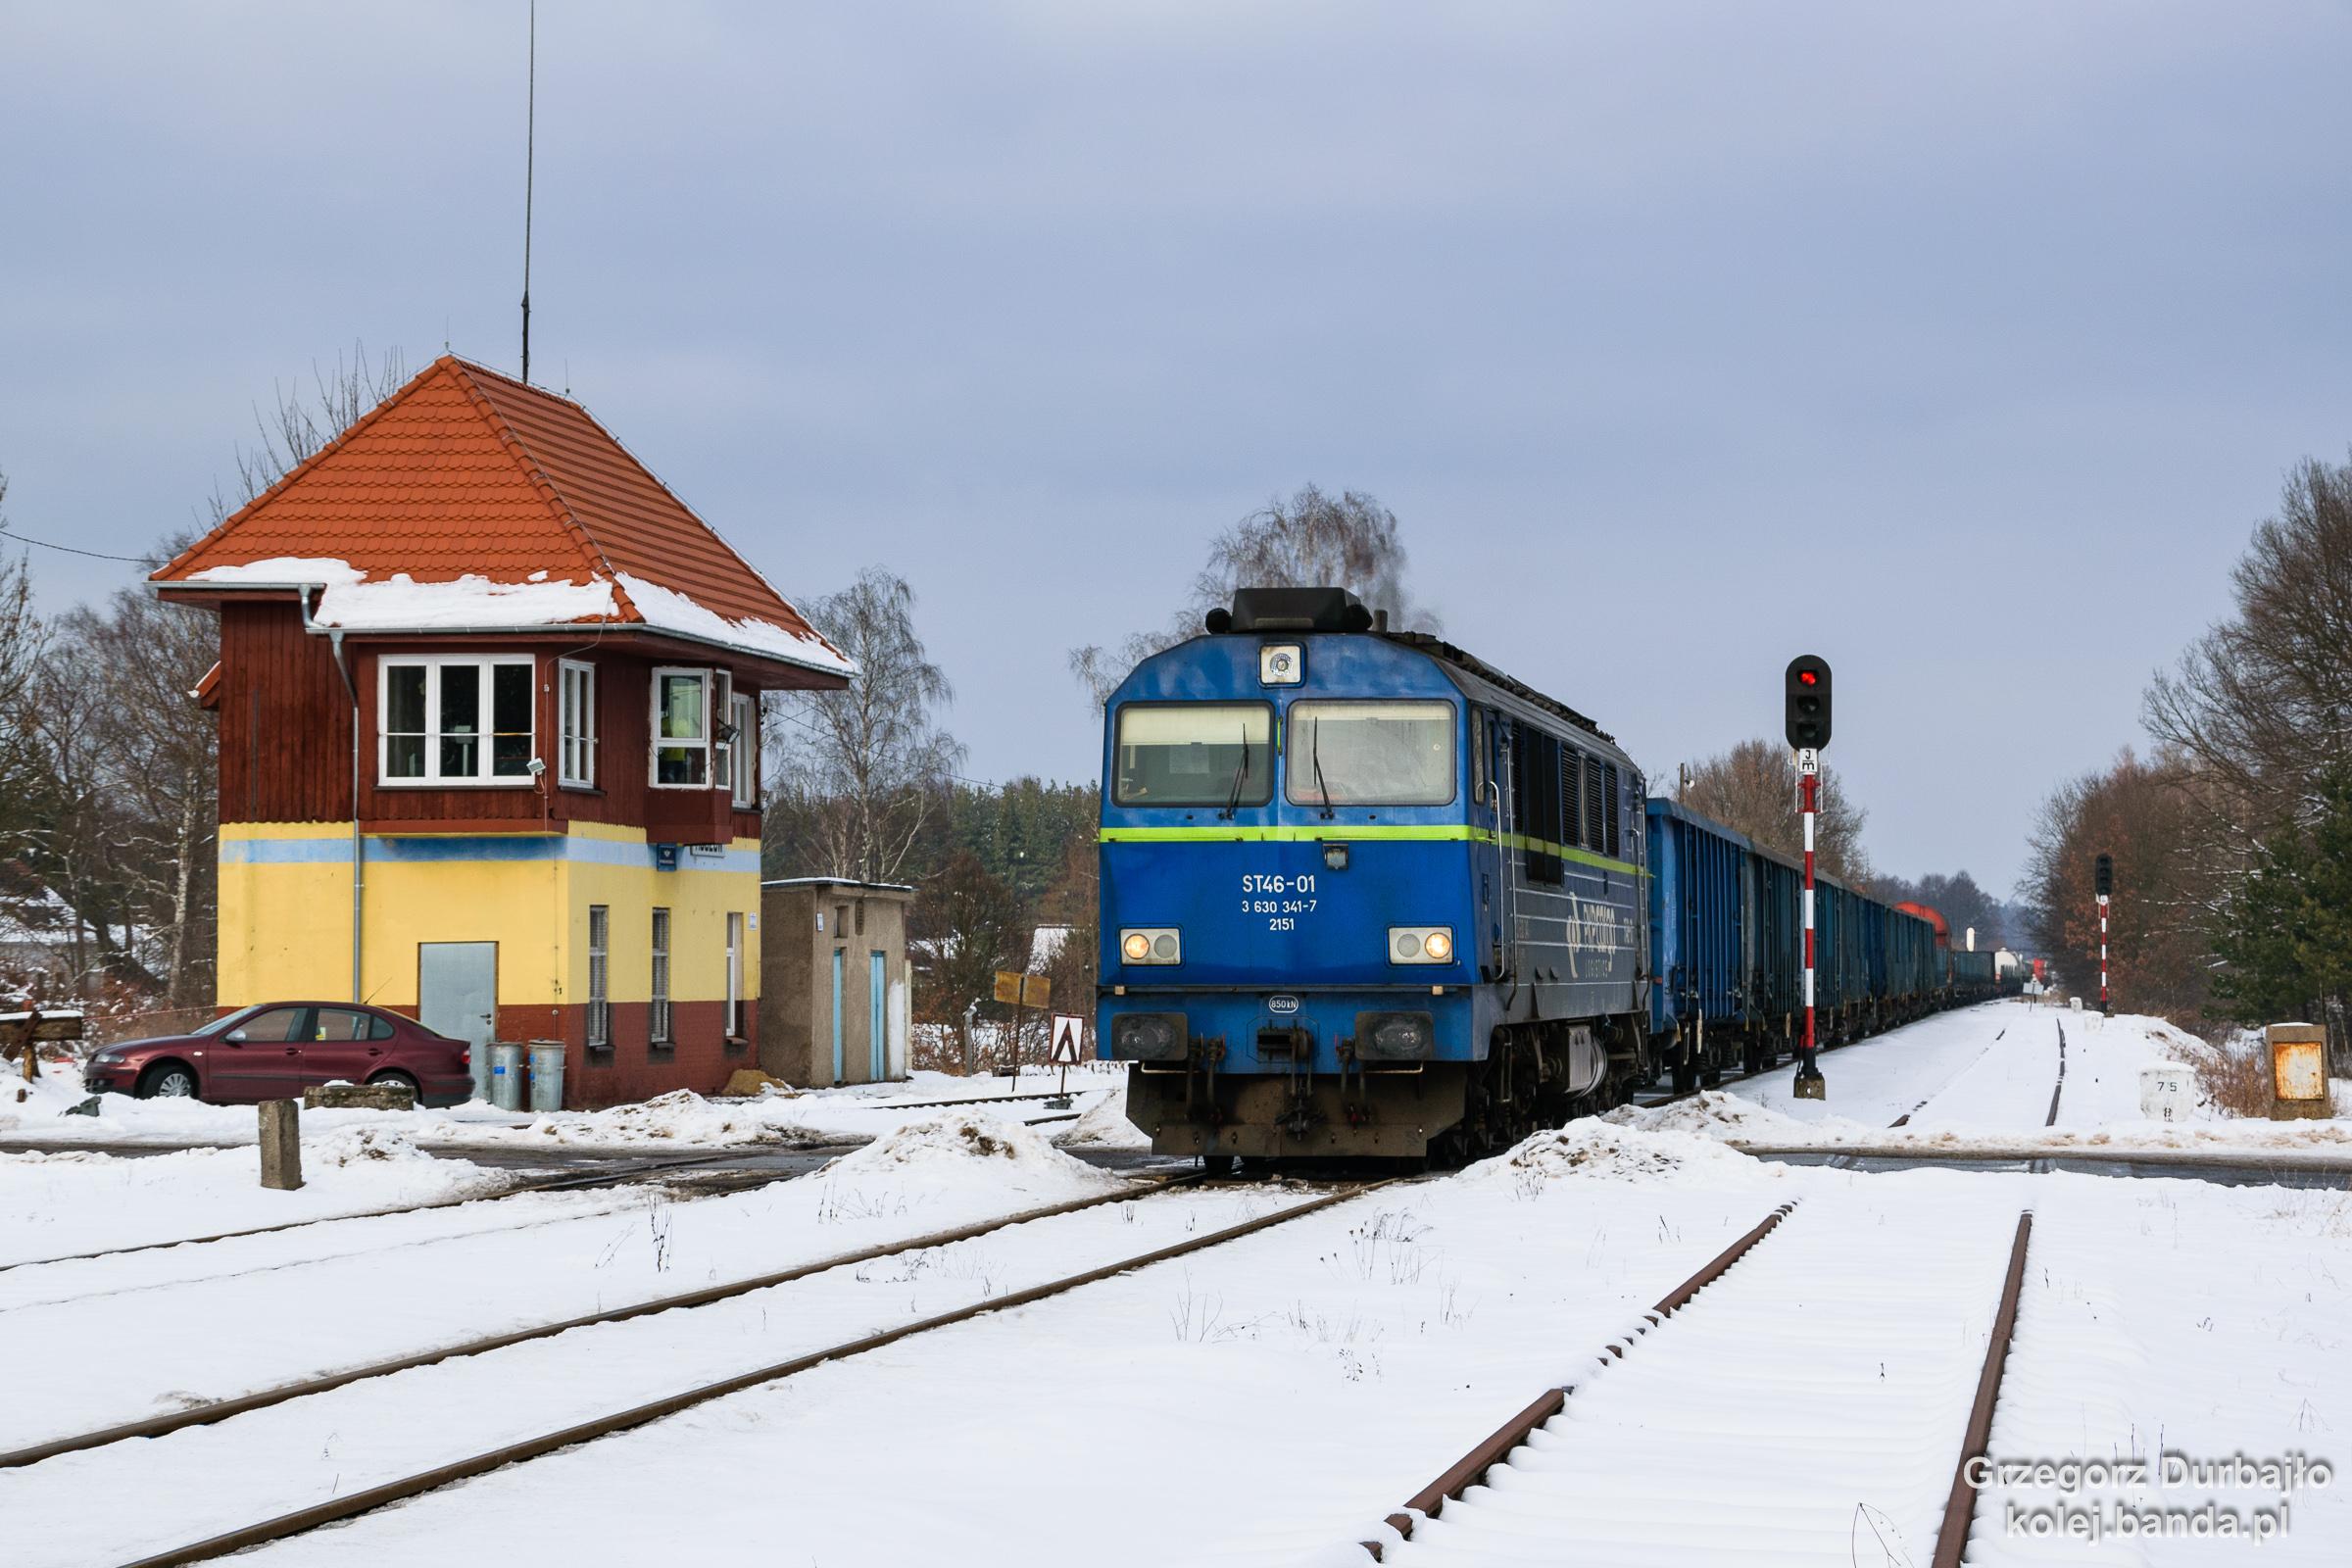 ST46-01